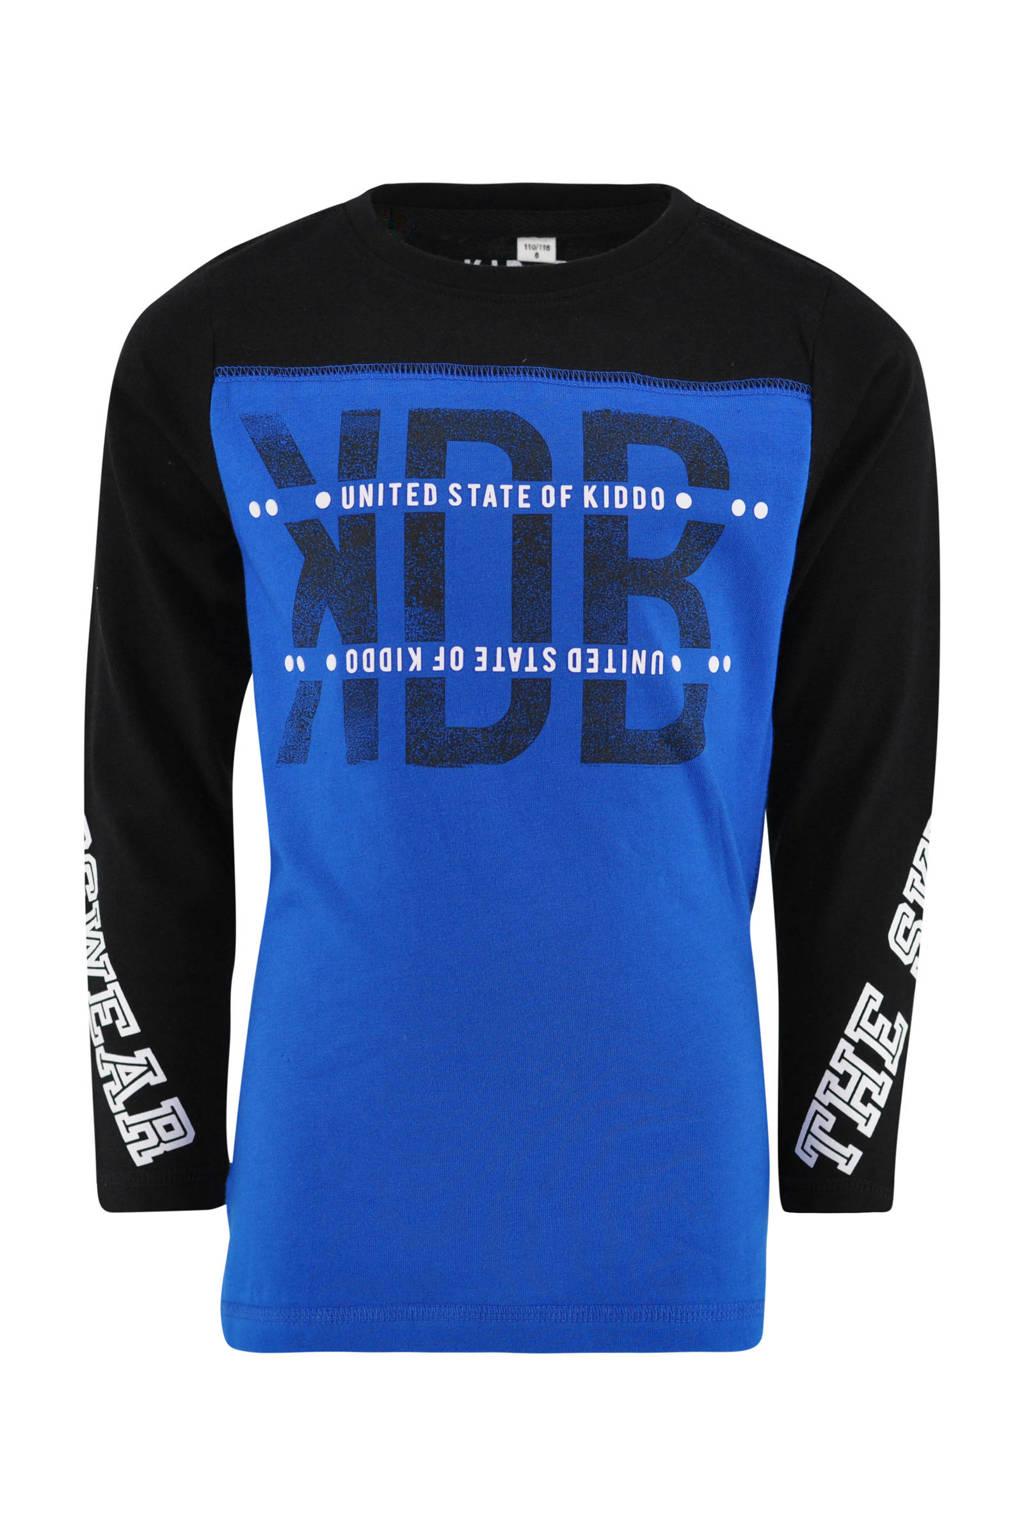 KIDDO longsleeve Pierre met tekst kobaltblauw/zwart, Kobaltblauw/zwart